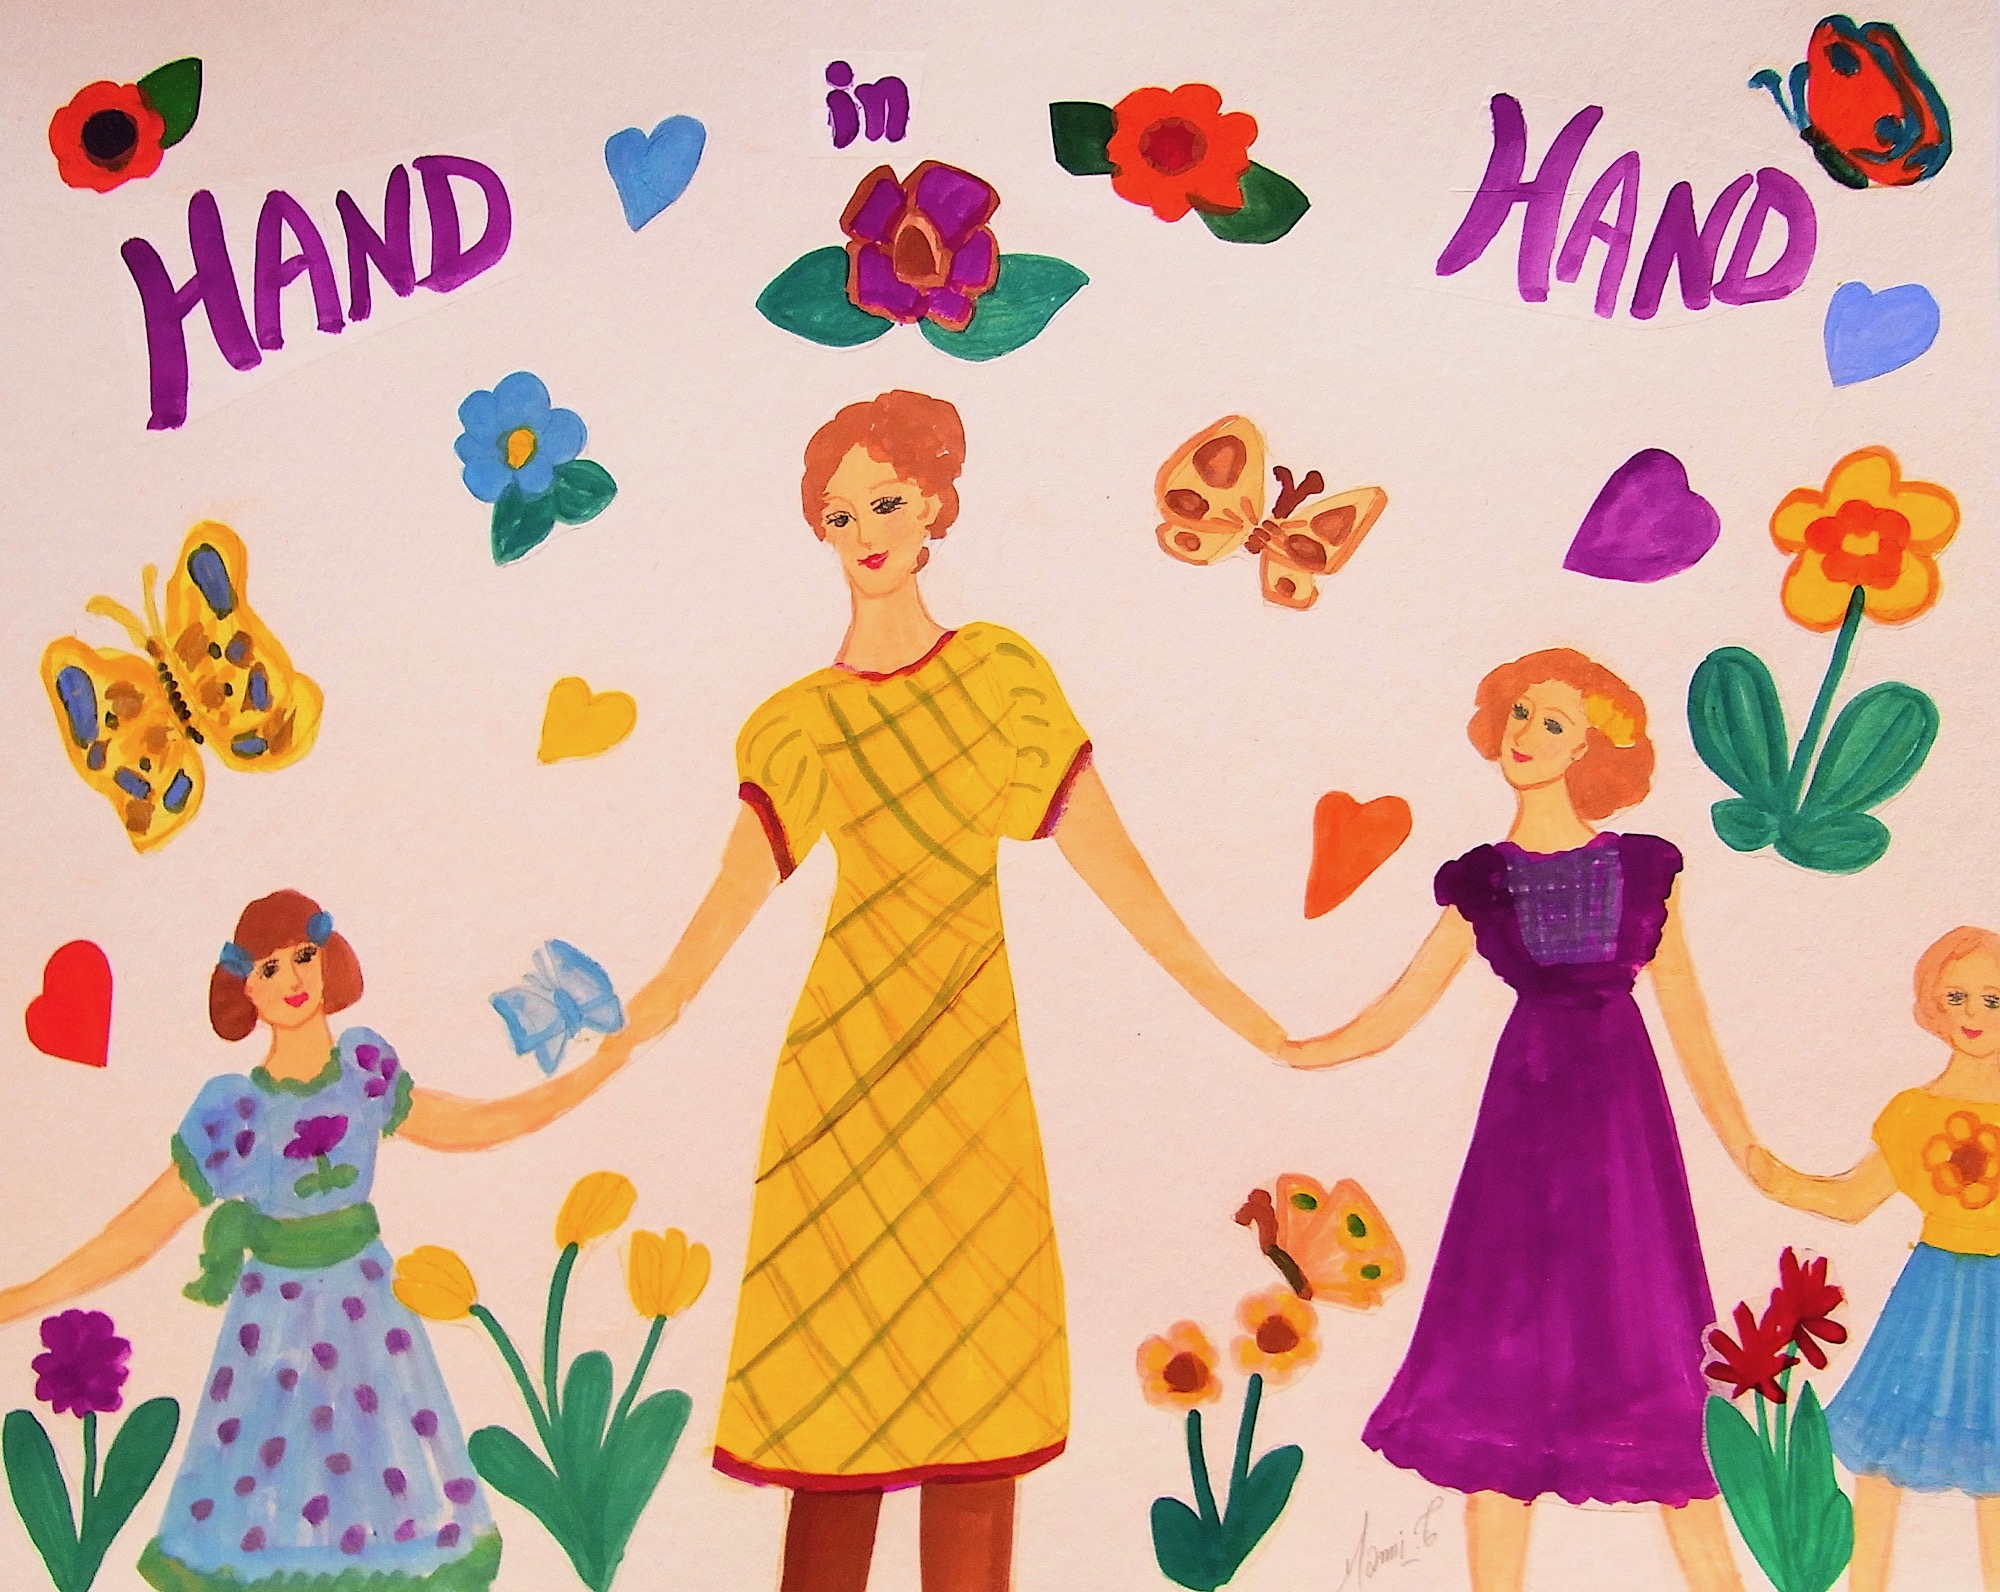 MAMI / Images et Poésie, HAND in HAND